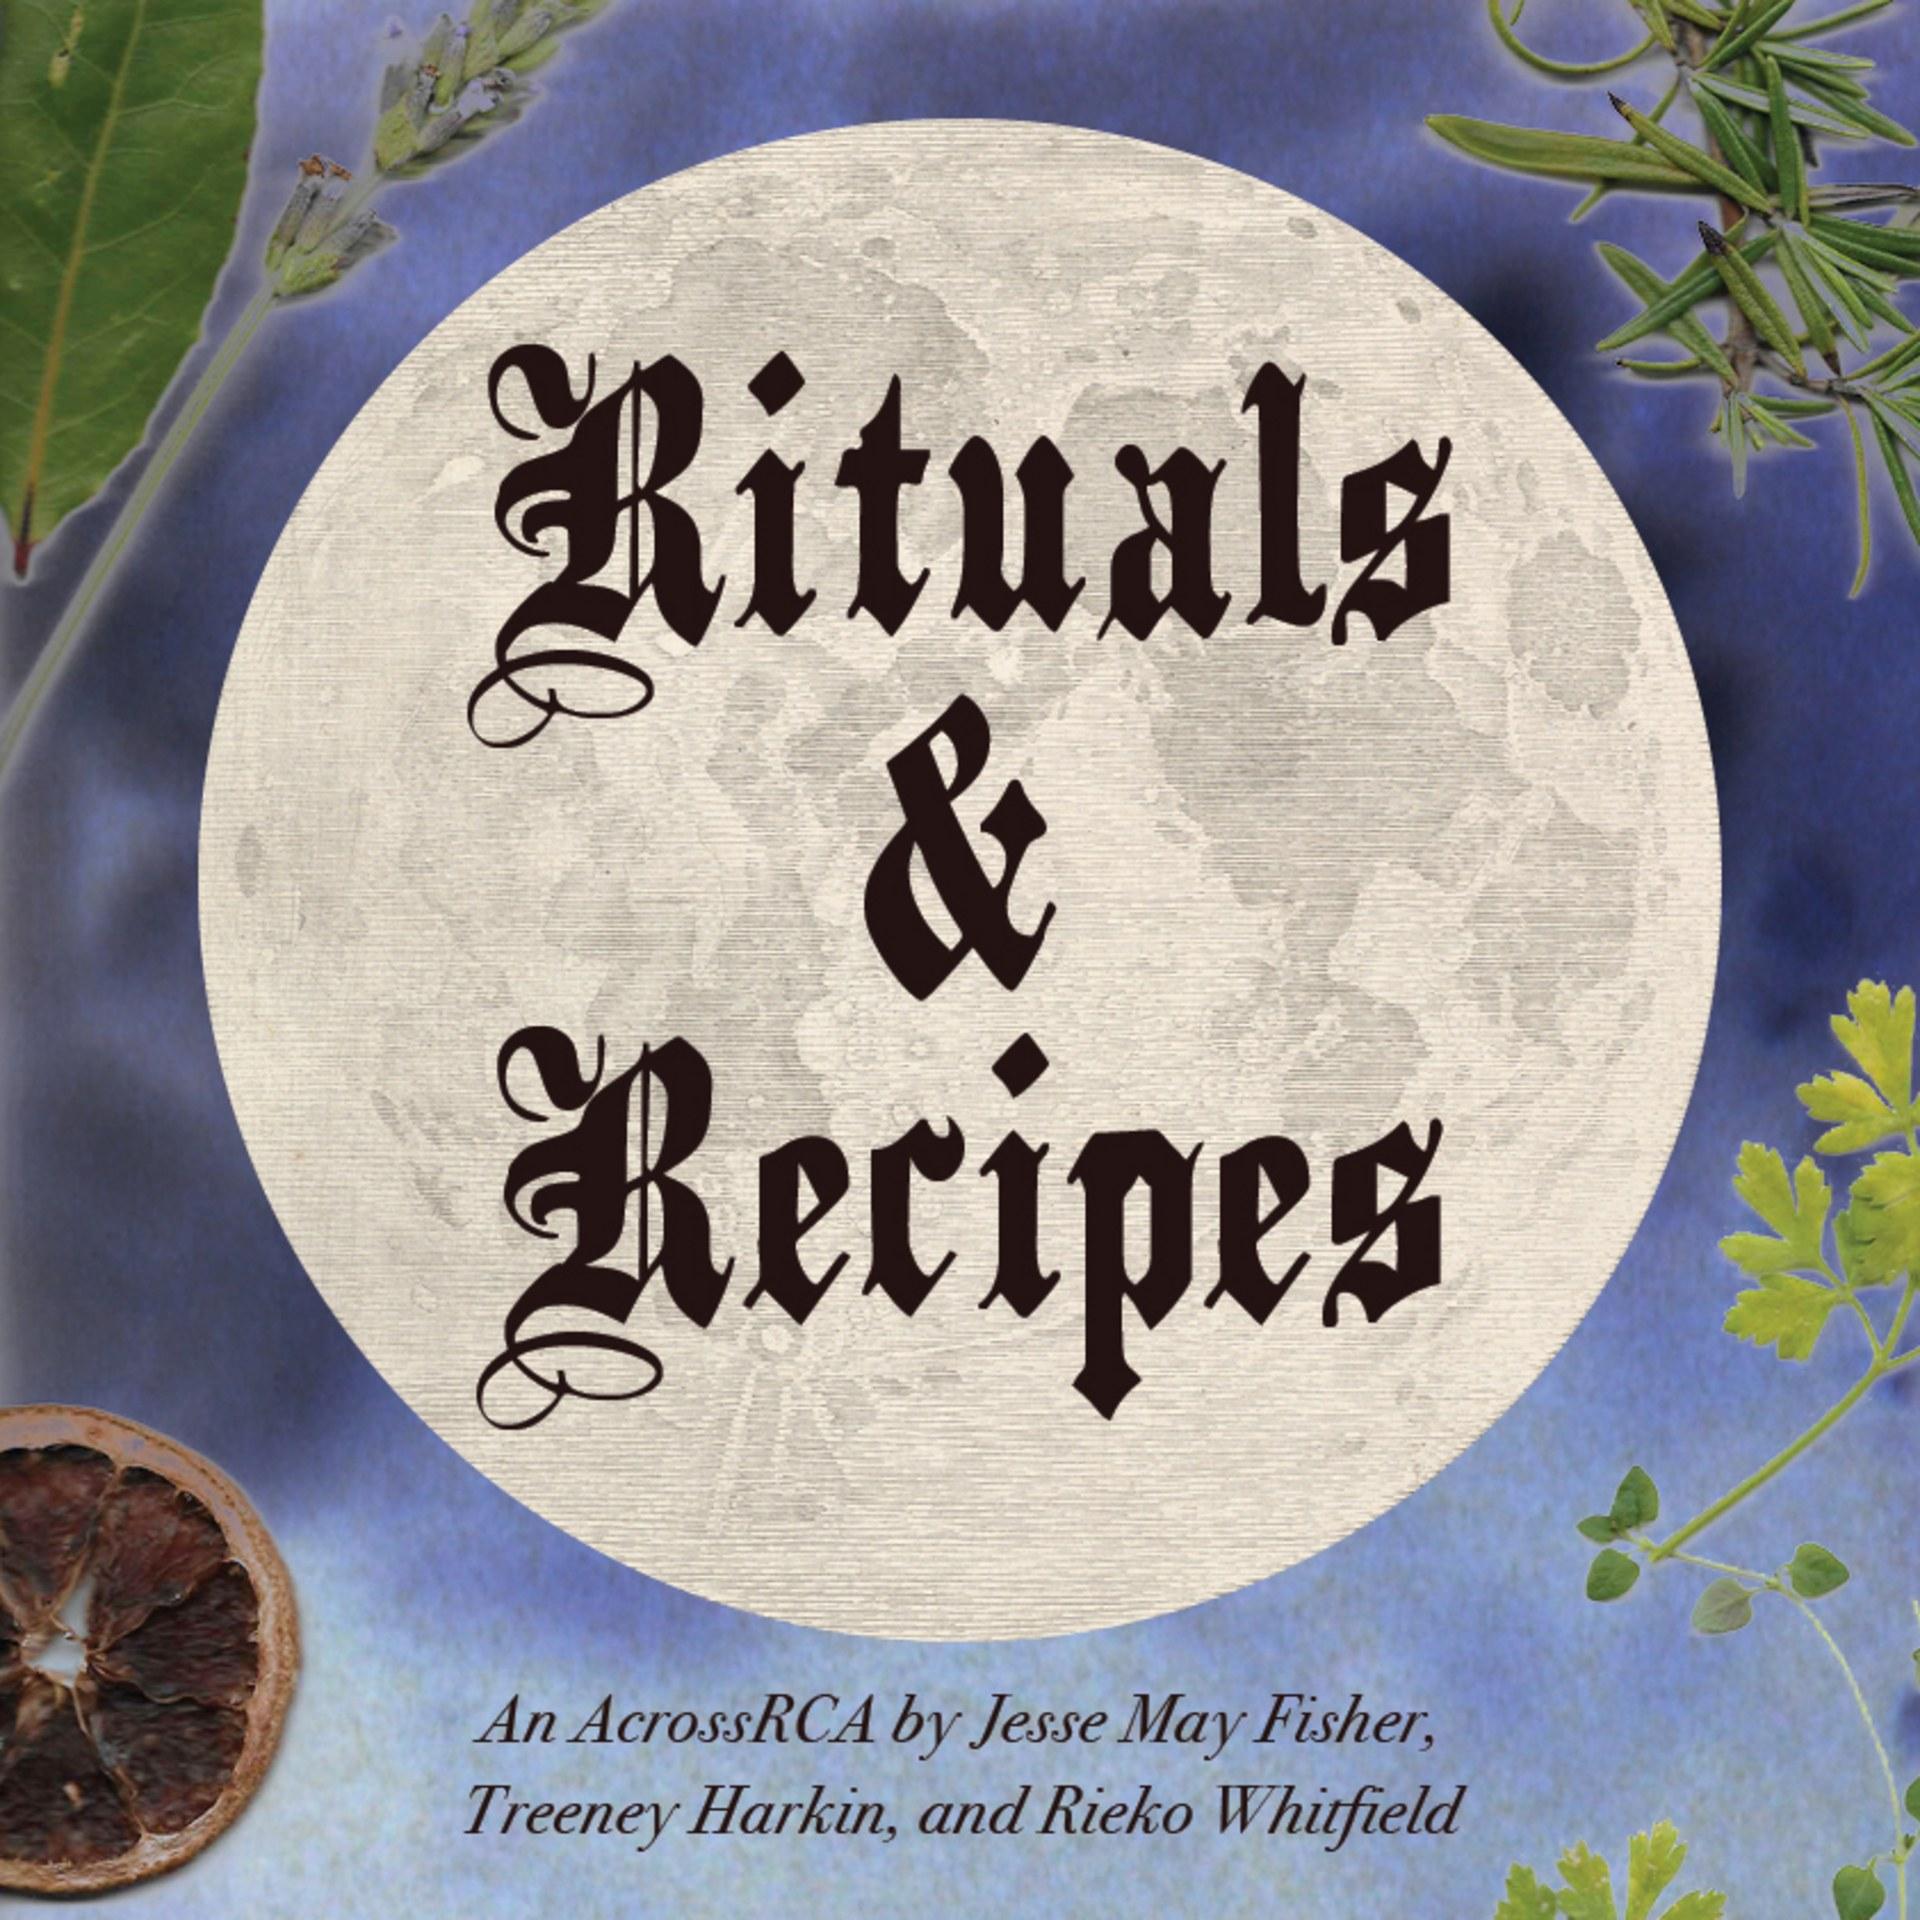 Rituals and Recipes